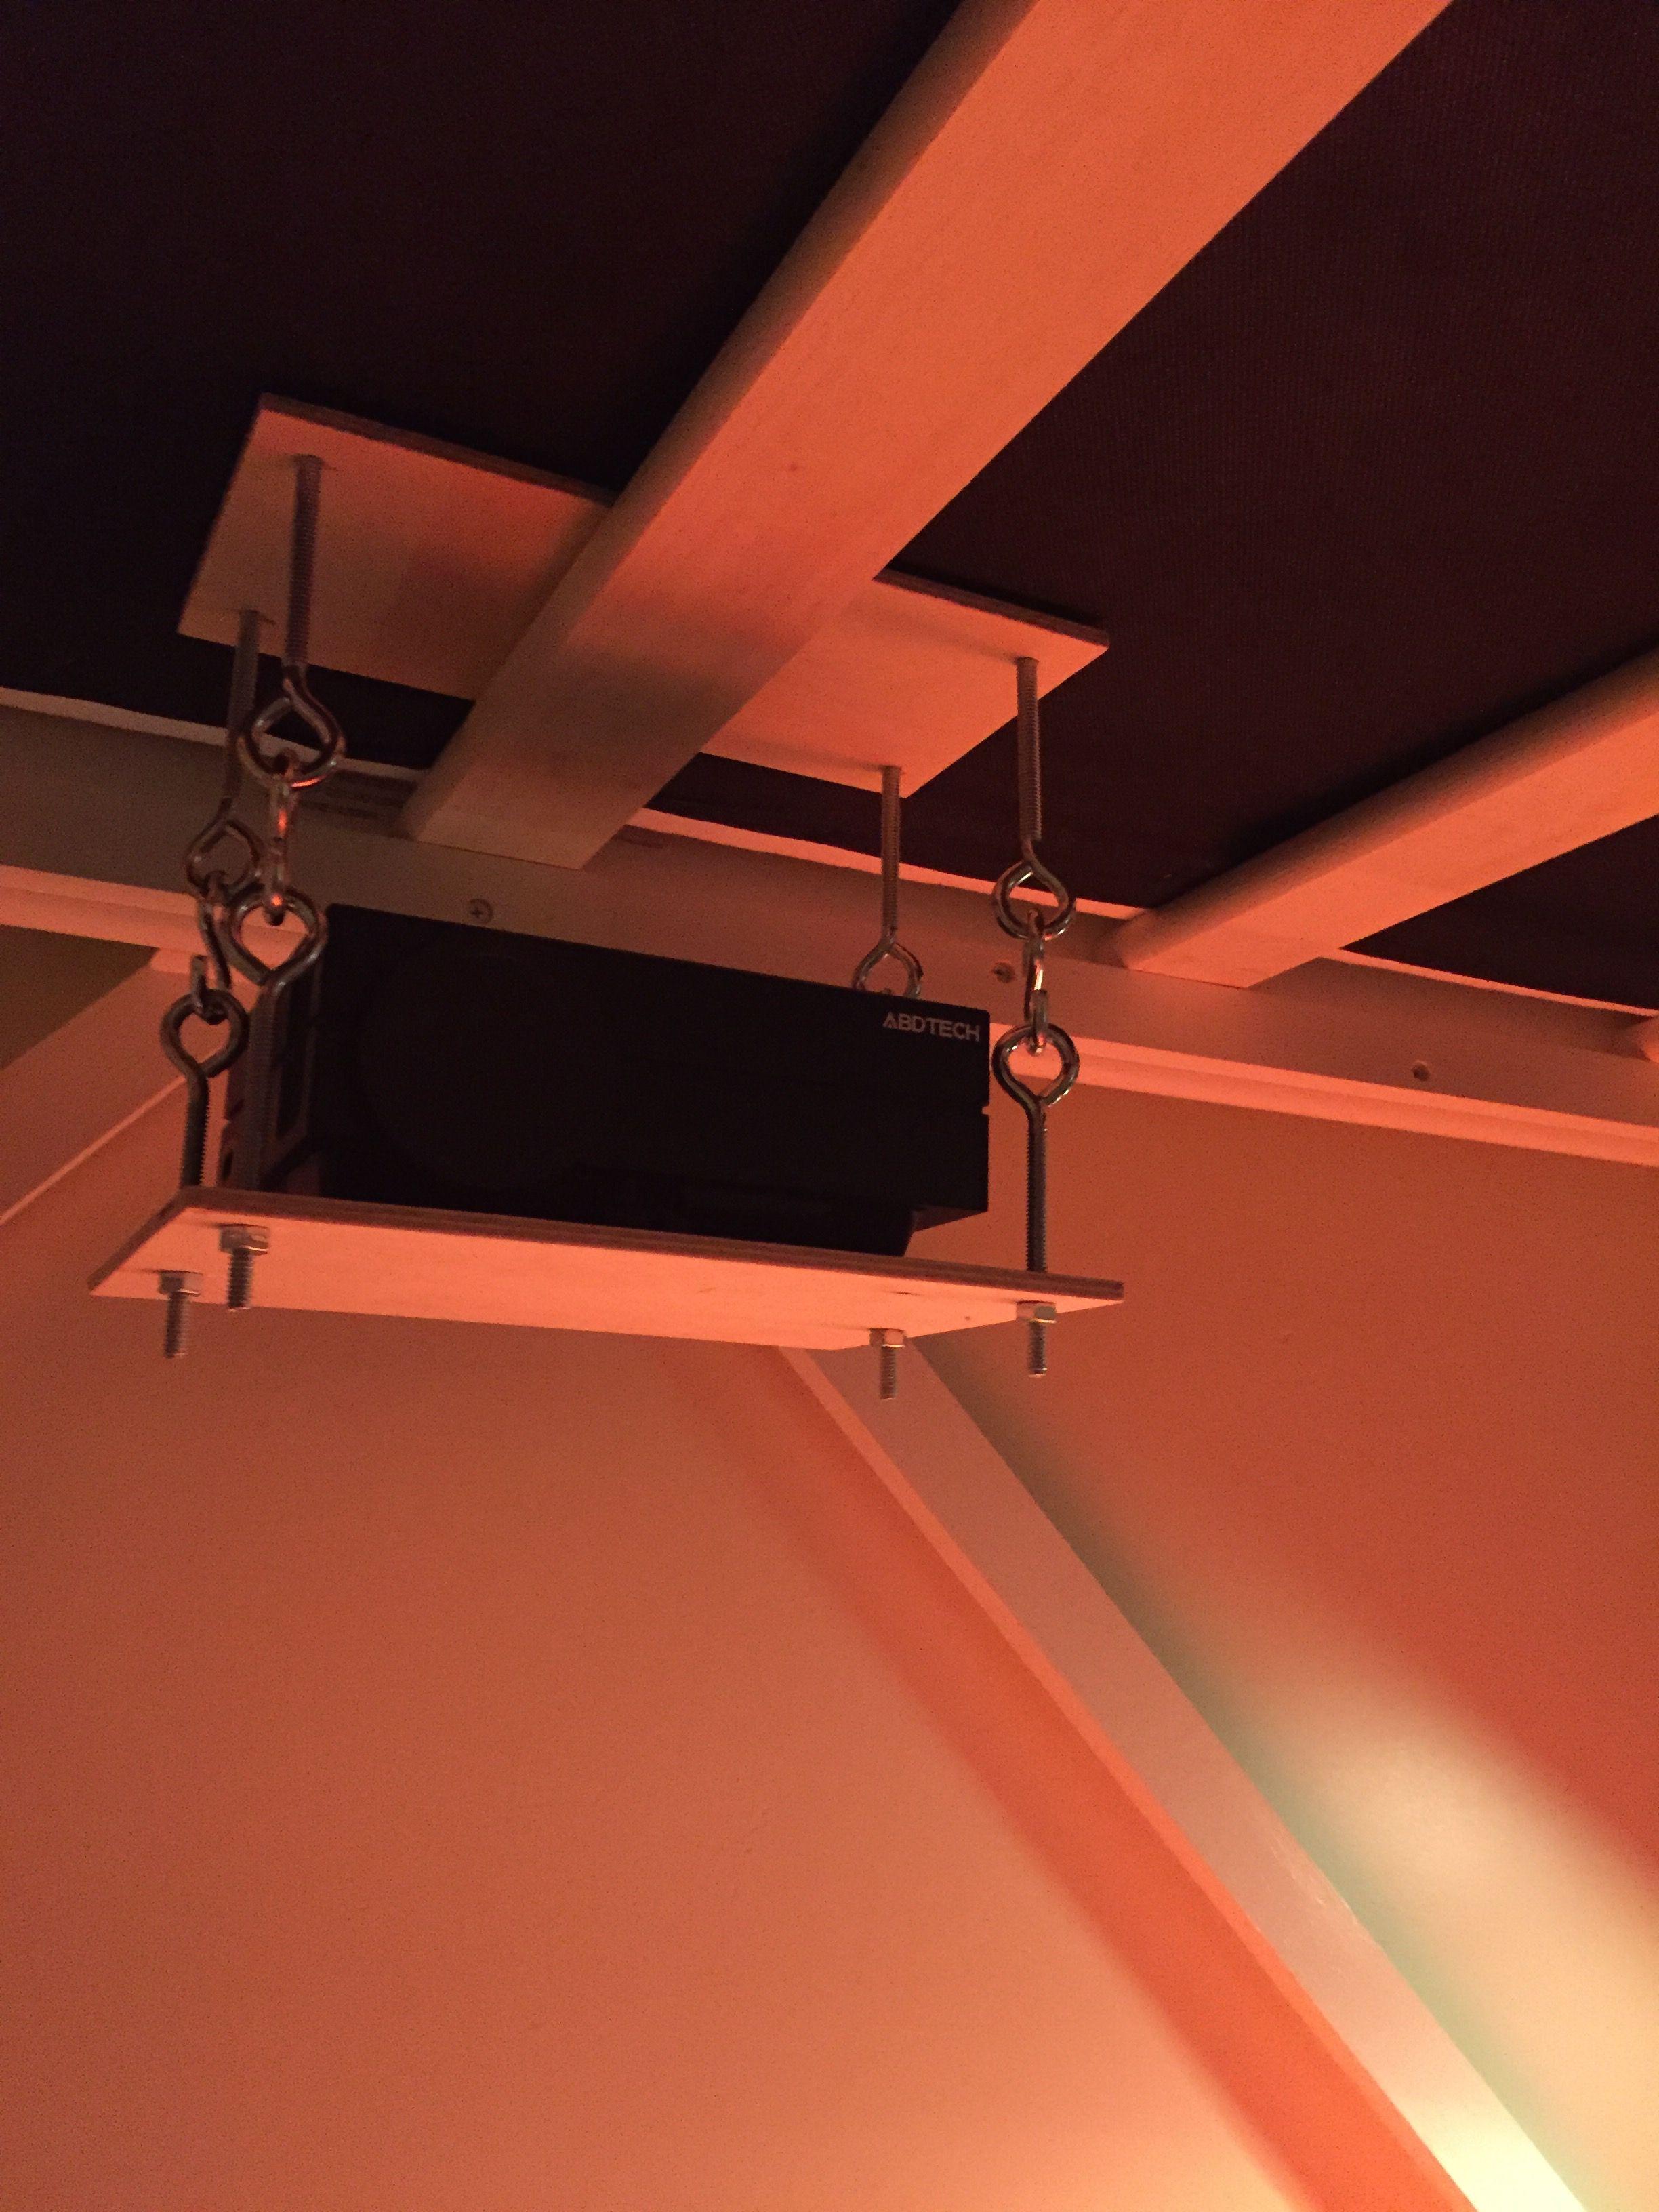 diy adjustable projector mount for underneath loft bed super easy